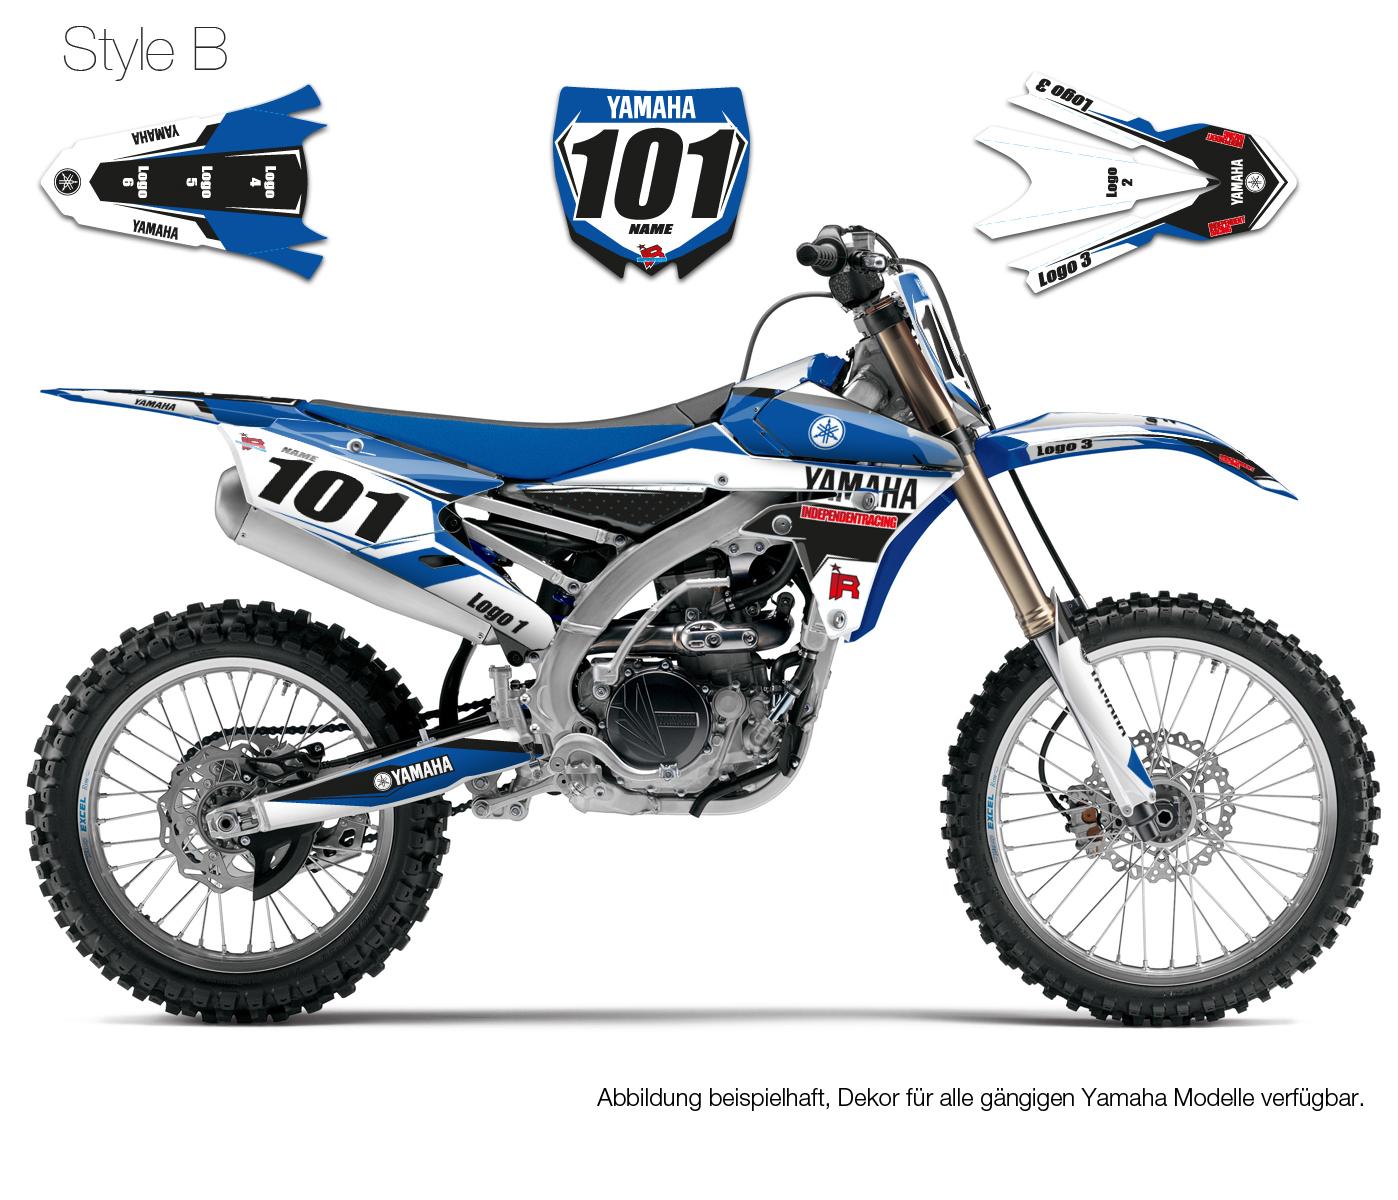 Dekor Yamaha Stock1